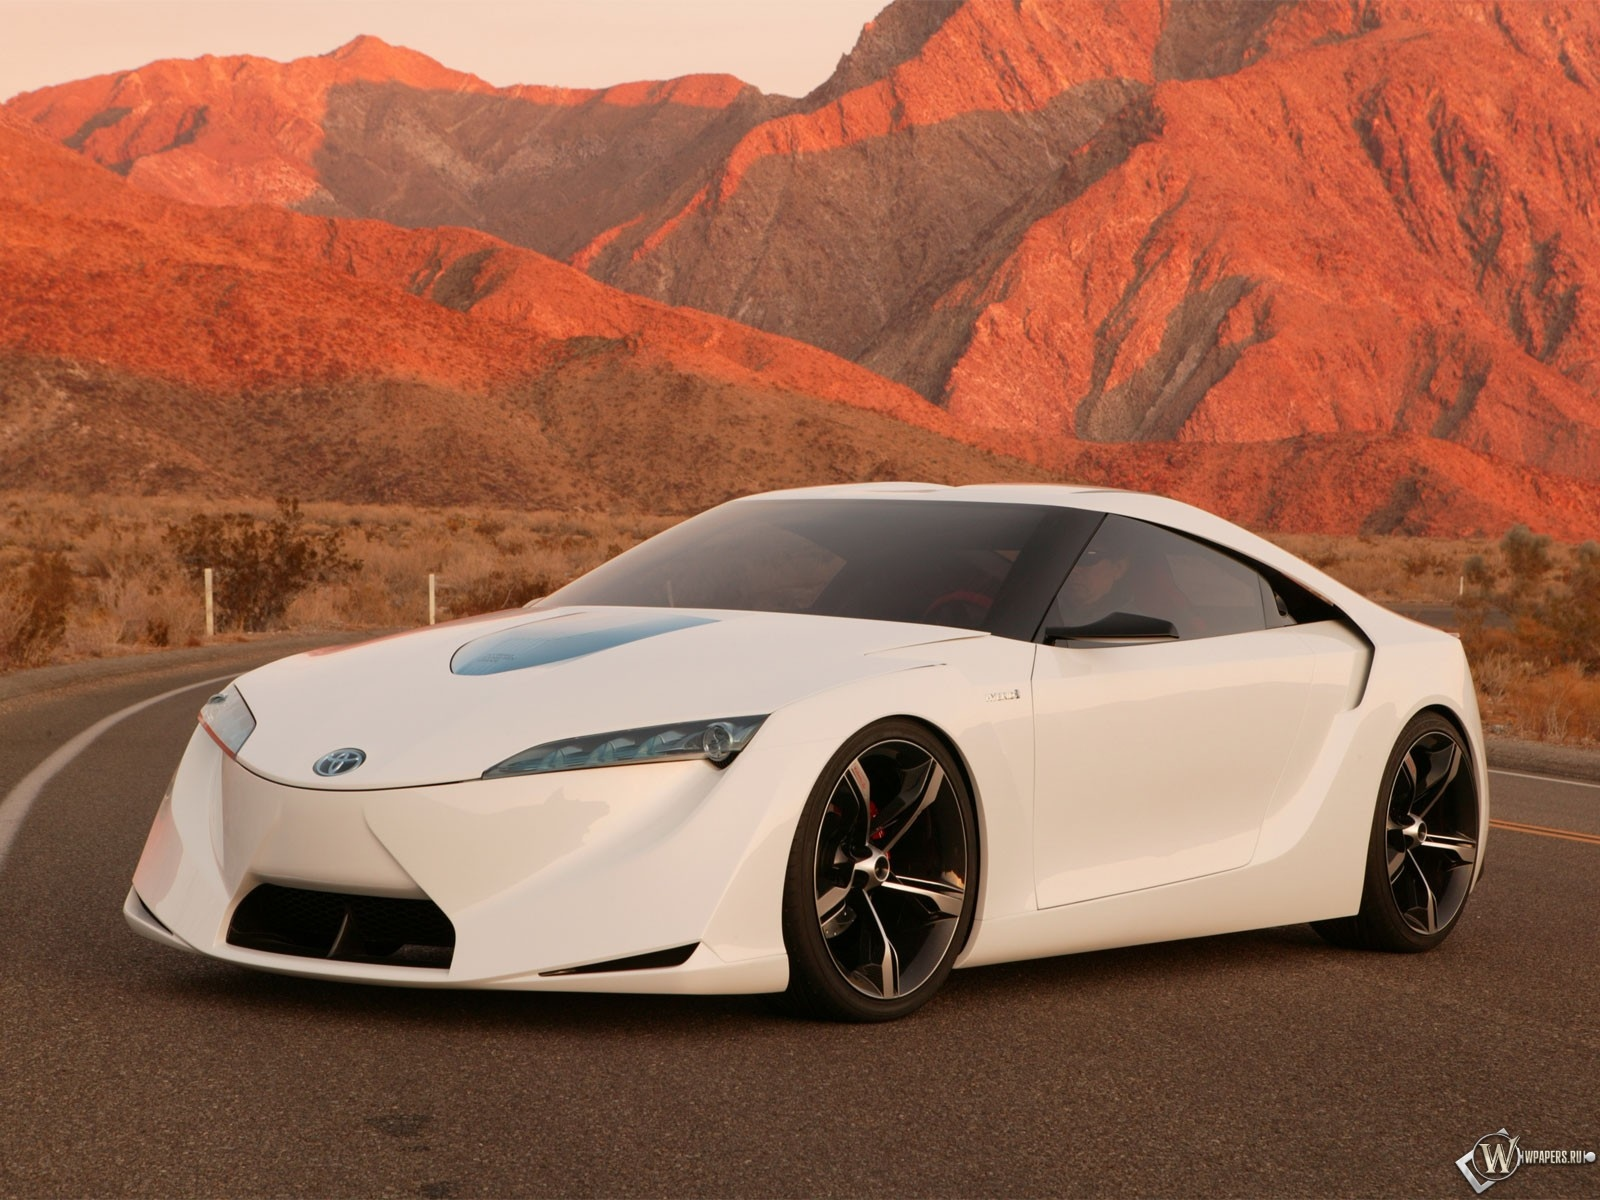 BMW/Toyota vs Tesla: Hydrogen vs Pure EV